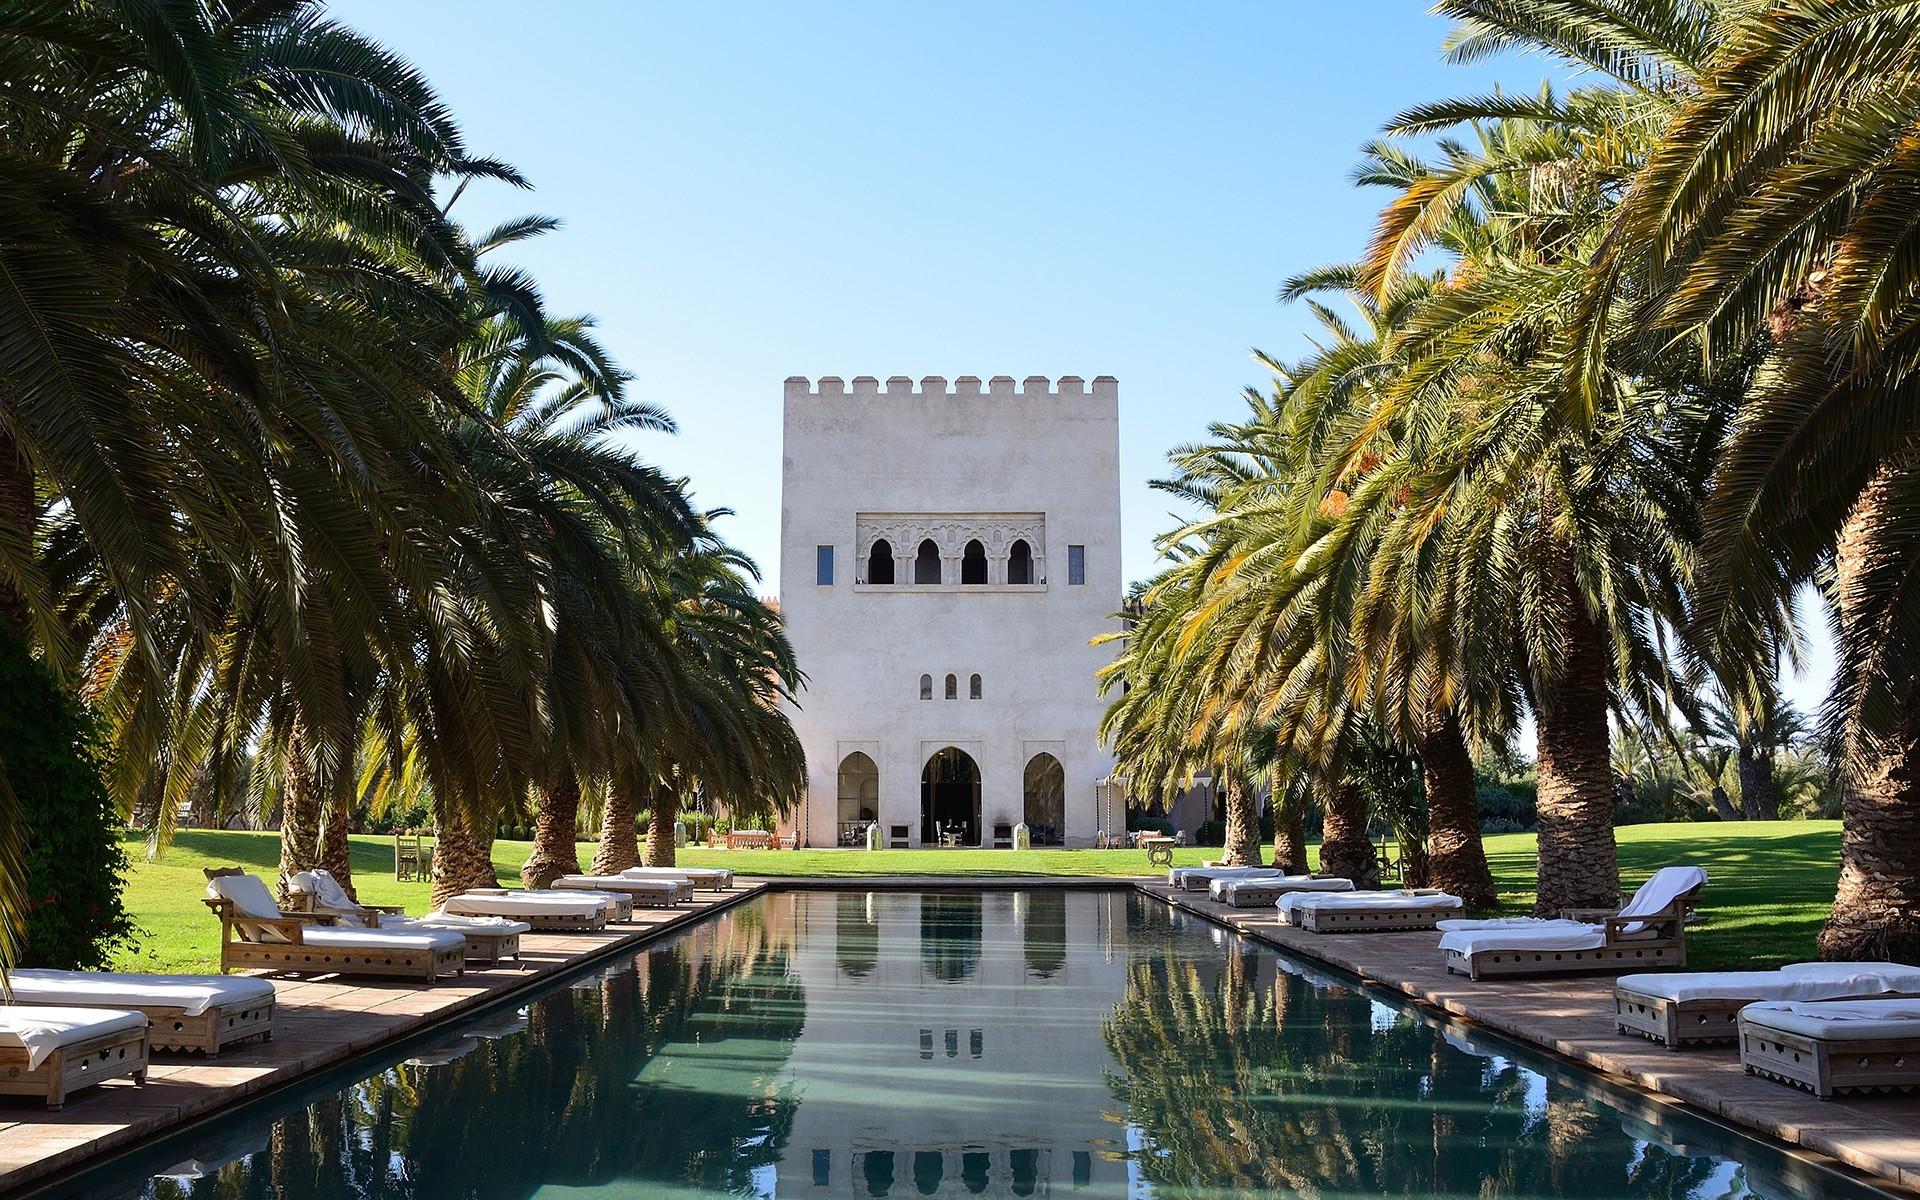 Ksar Char Bagh Hotel di lusso e Ristorante gourmet in un parco Marrakech – Relais & Ch¢teaux